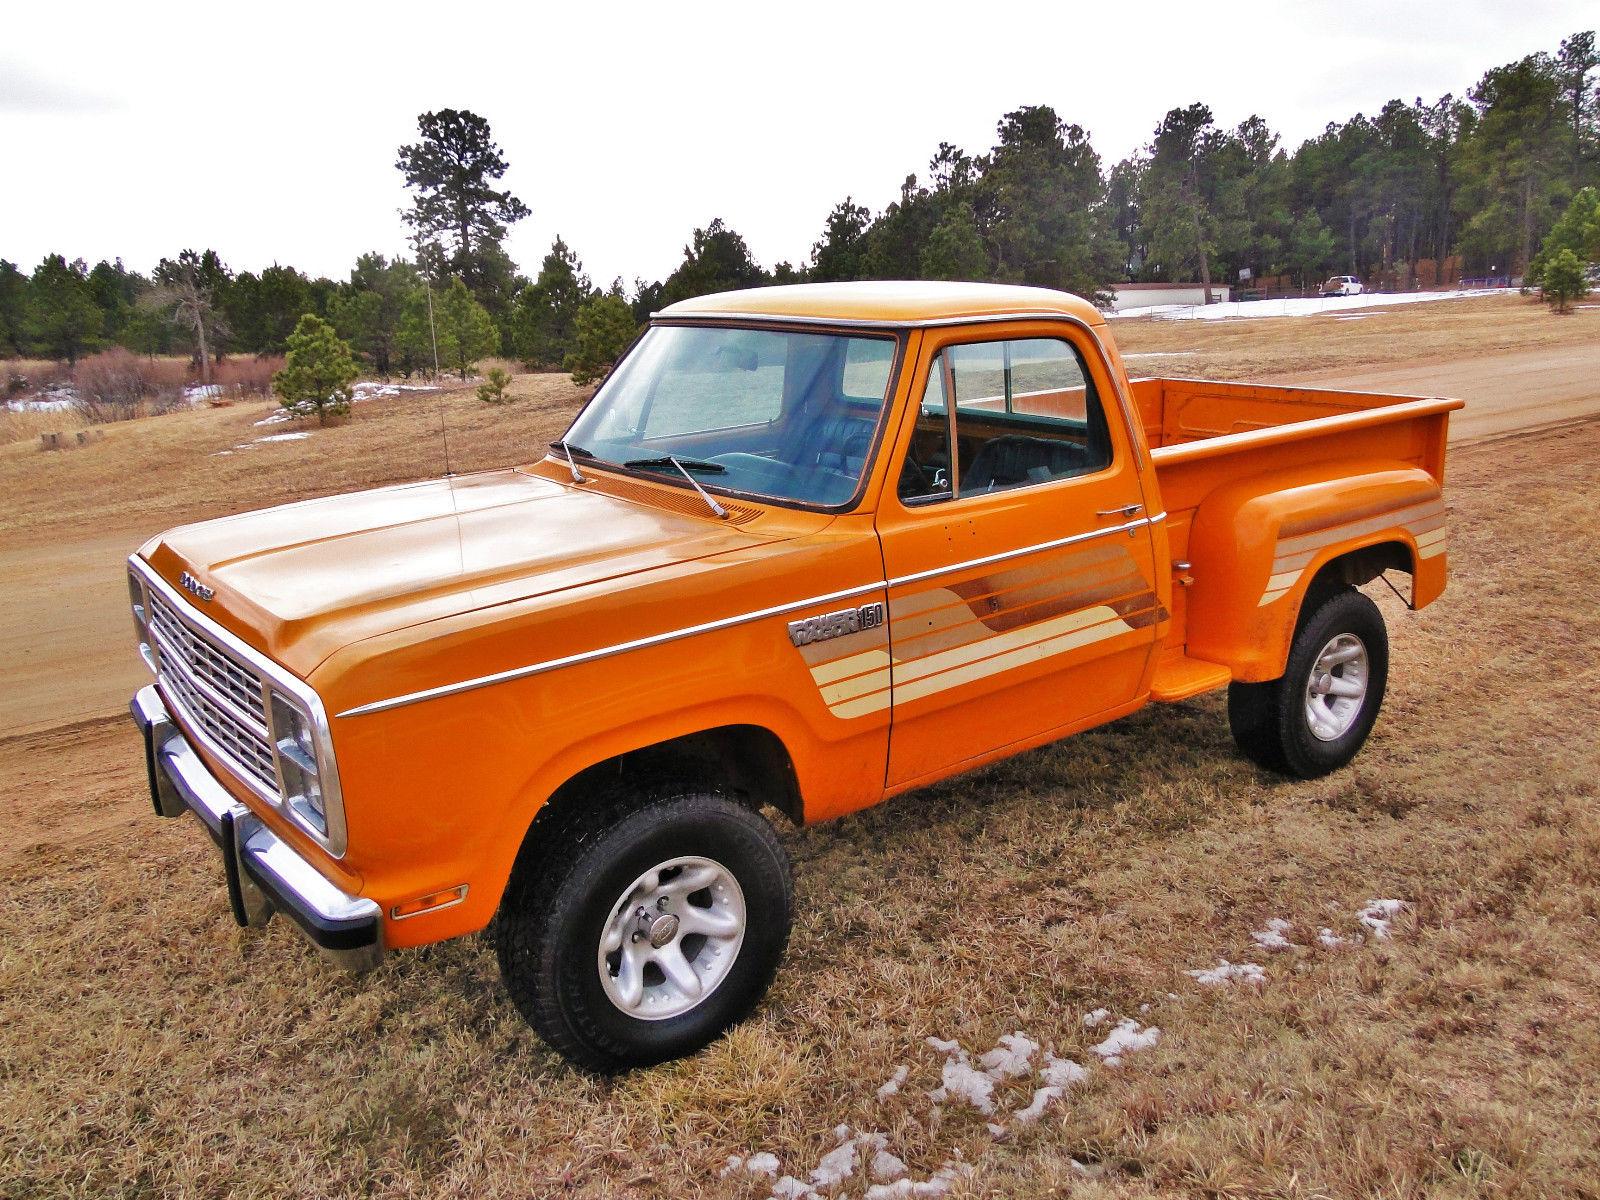 1979 Dodge Power Wagon Round Up very rare survivor Warlock Top Hand for  sale in Colorado Springs, Colorado, United States